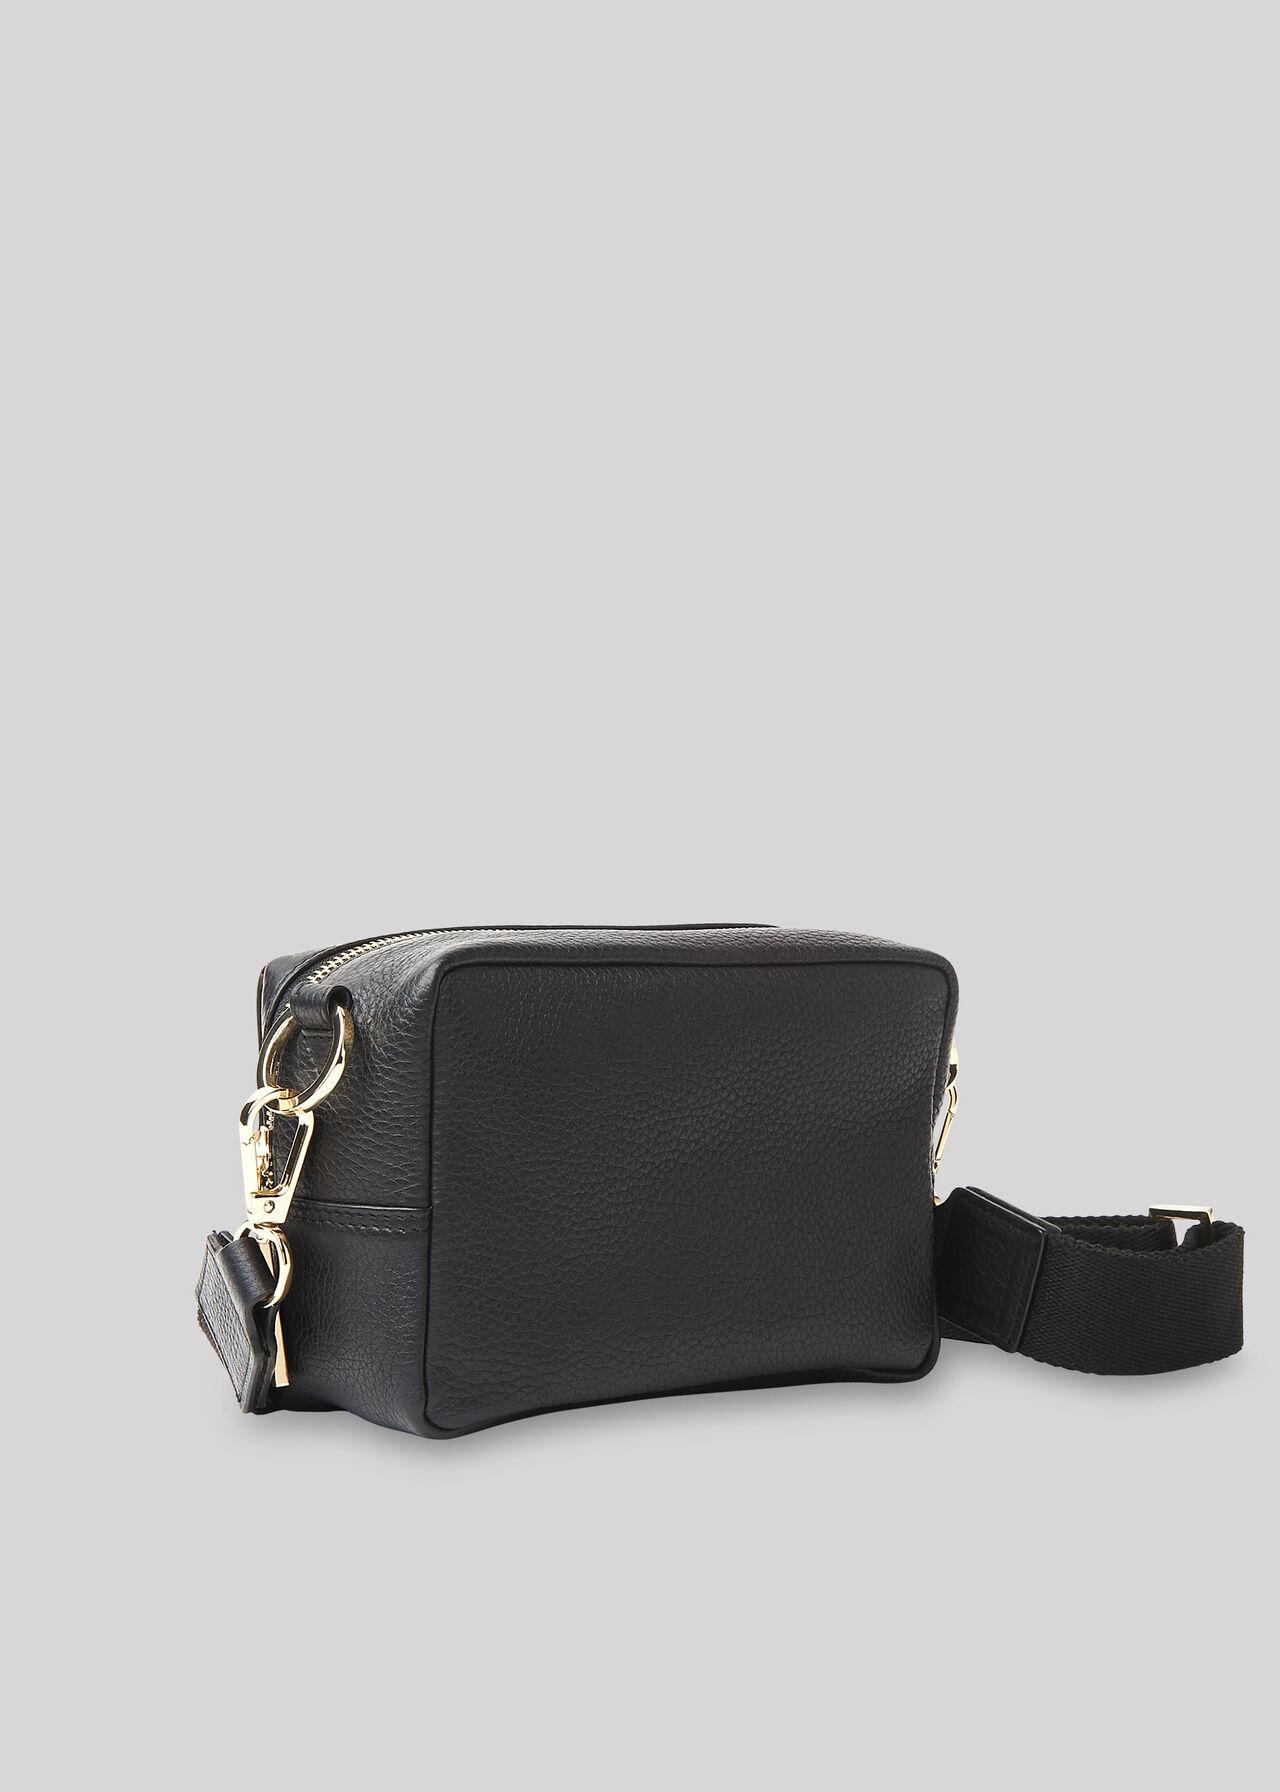 Bibi Leopard Crossbody Bag Black/Multi